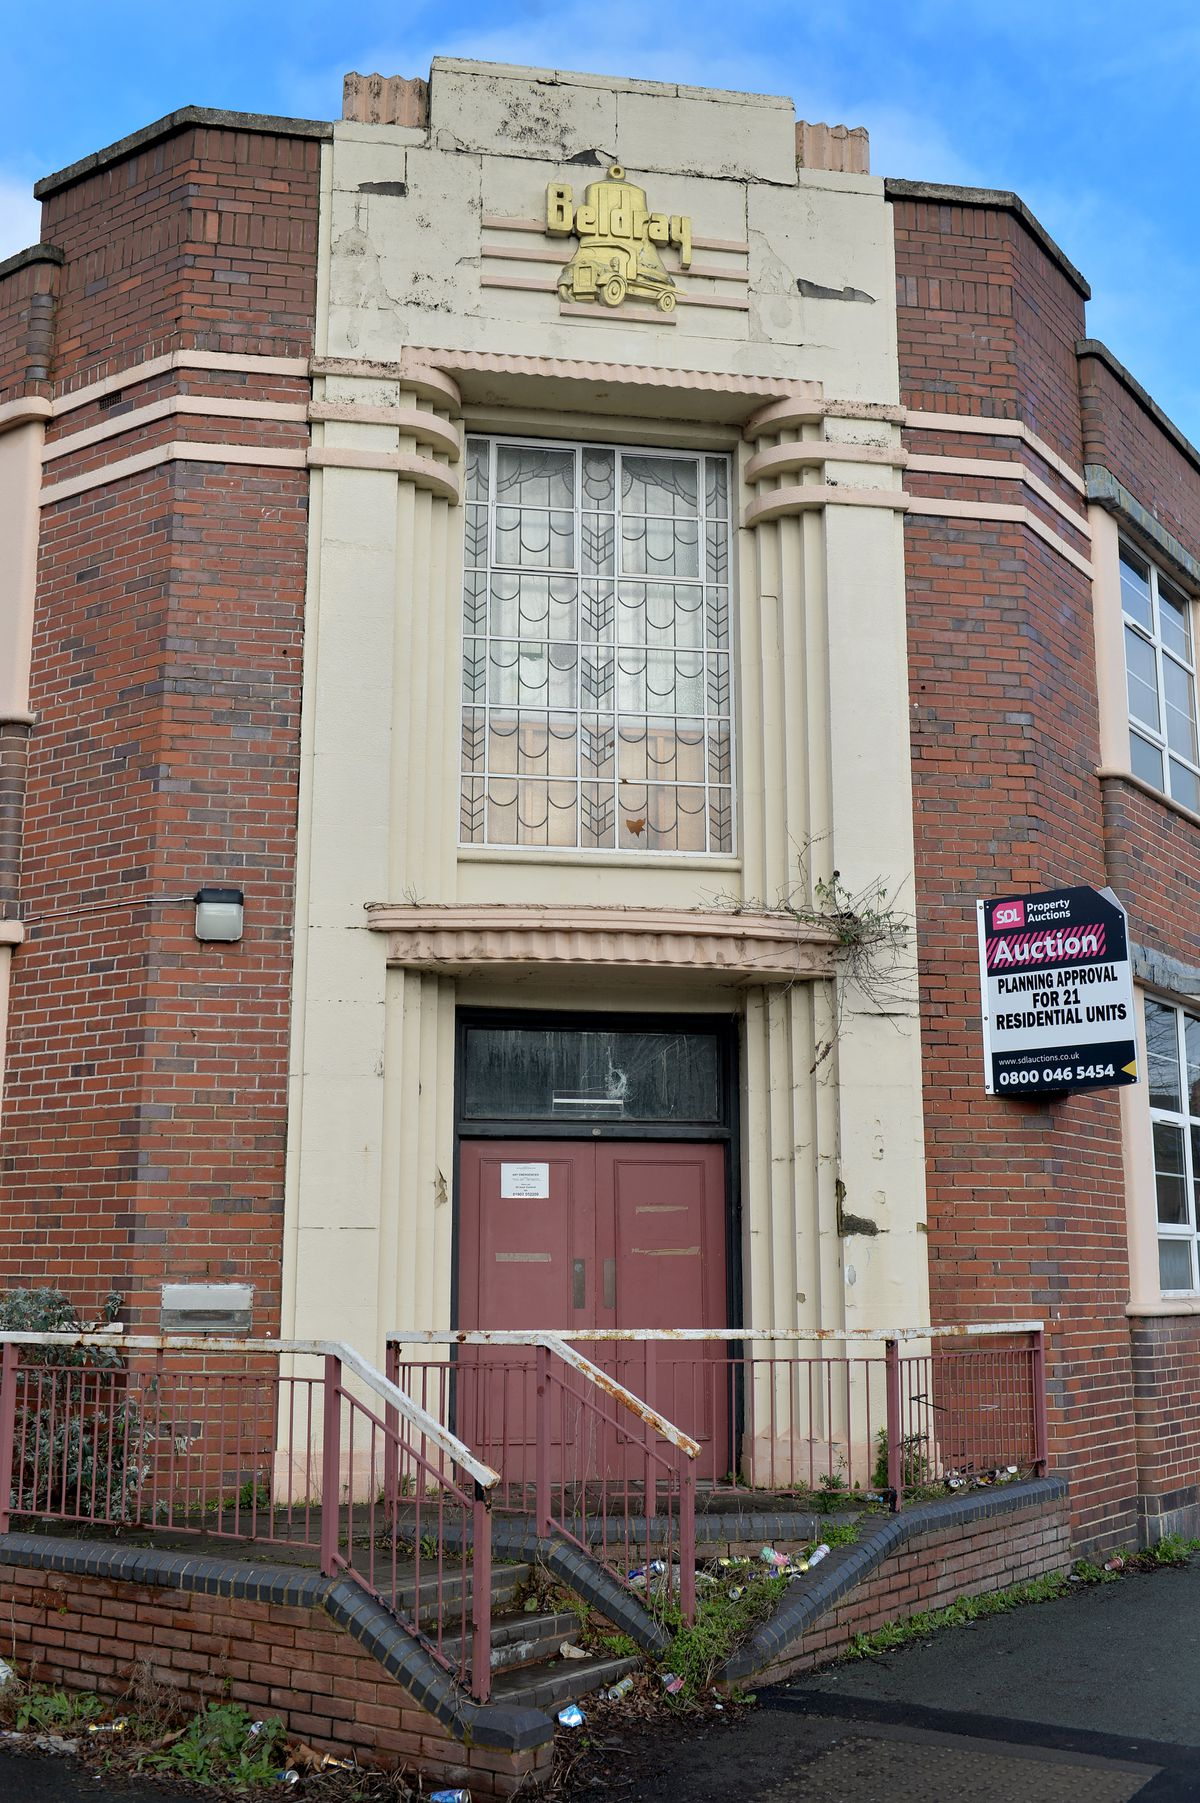 The two-storey Beldray building in Mount Pleasant, Bilston